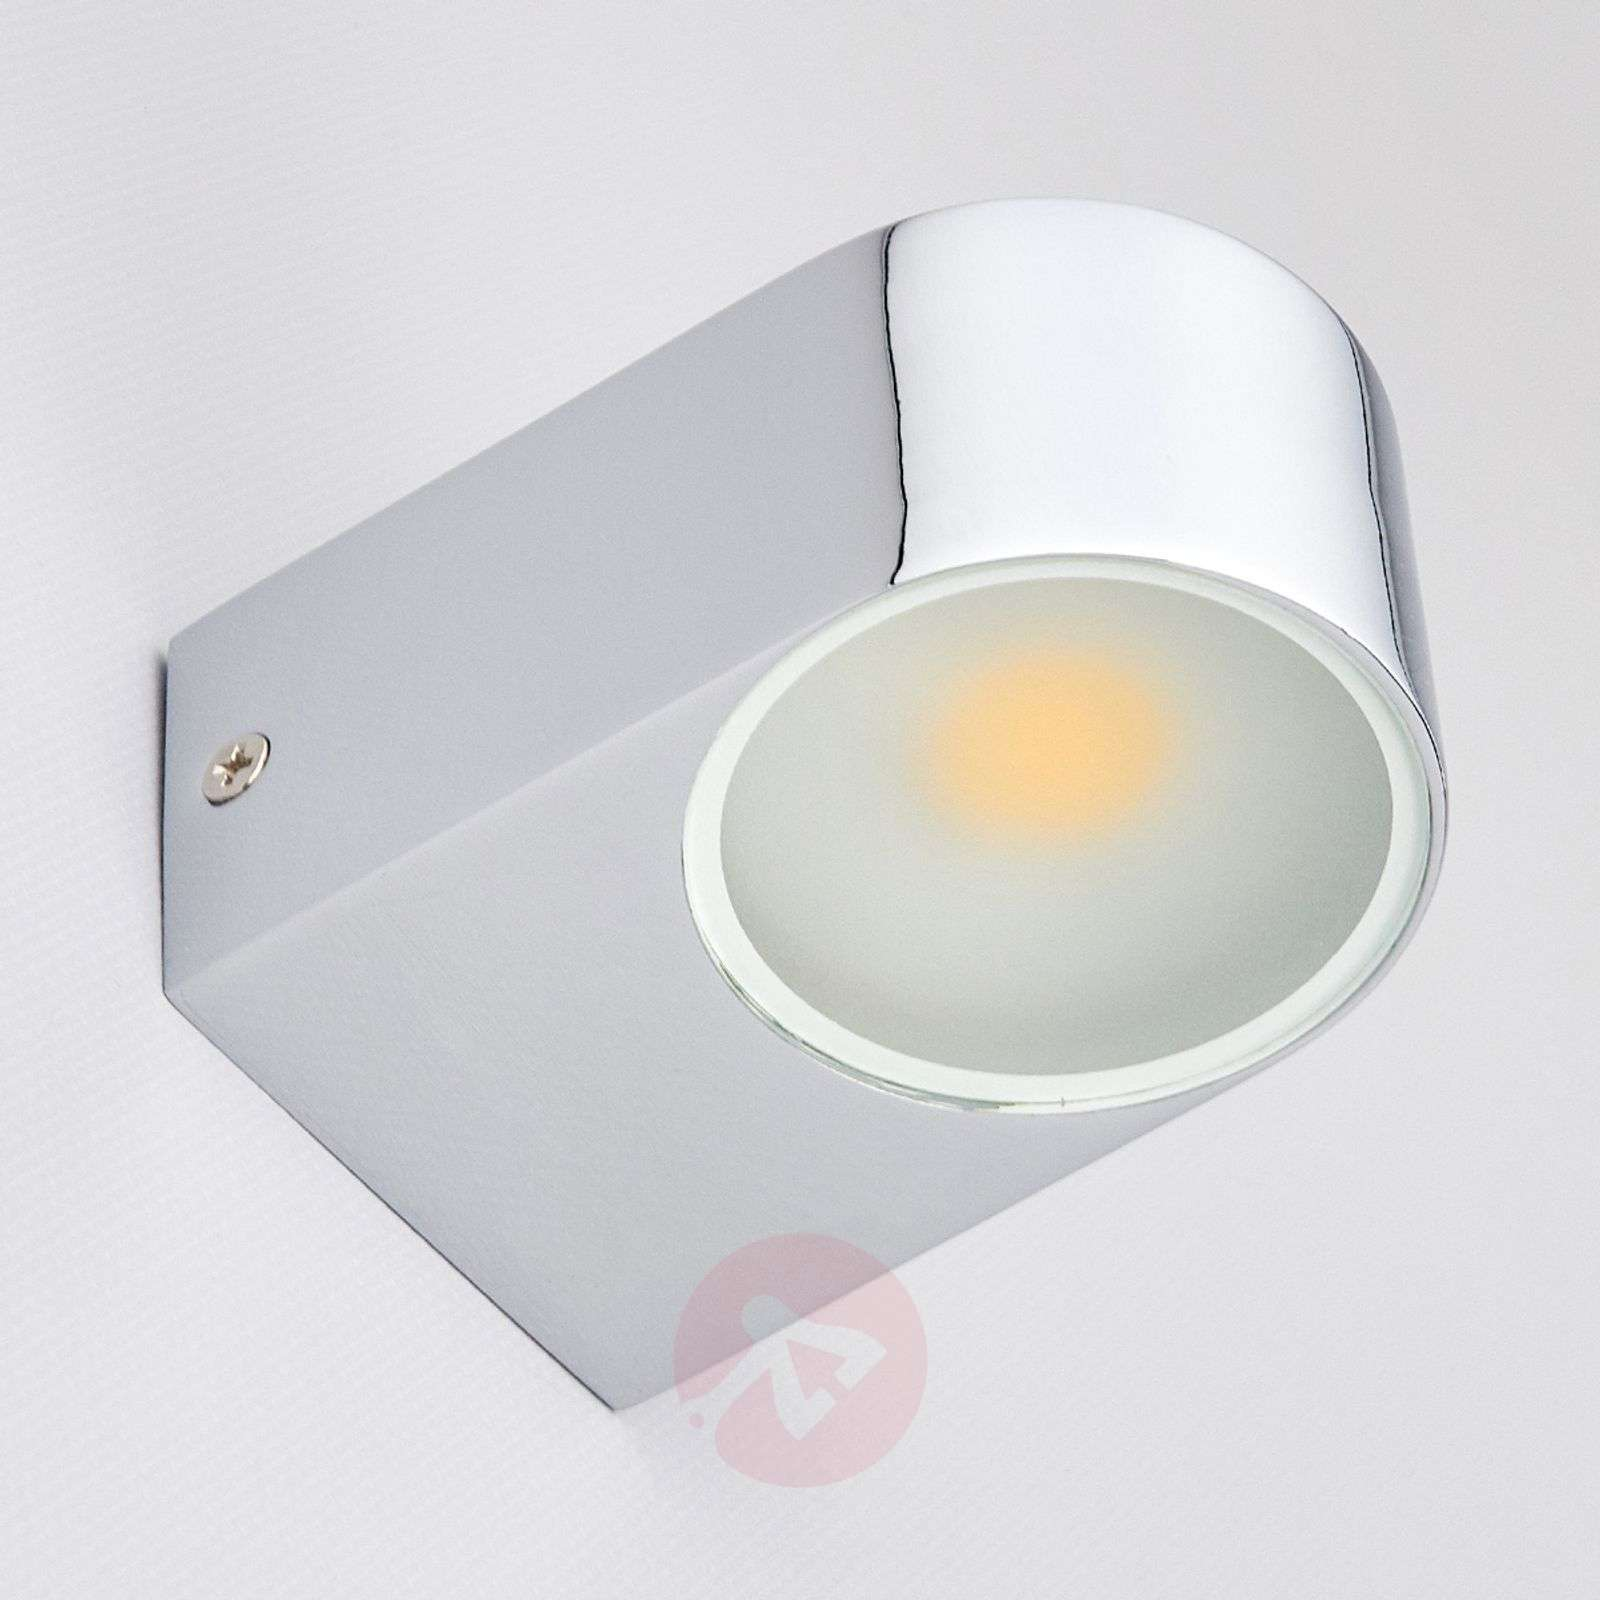 Marielle LED Bathroom Wall Light Chrome | Lights.ie